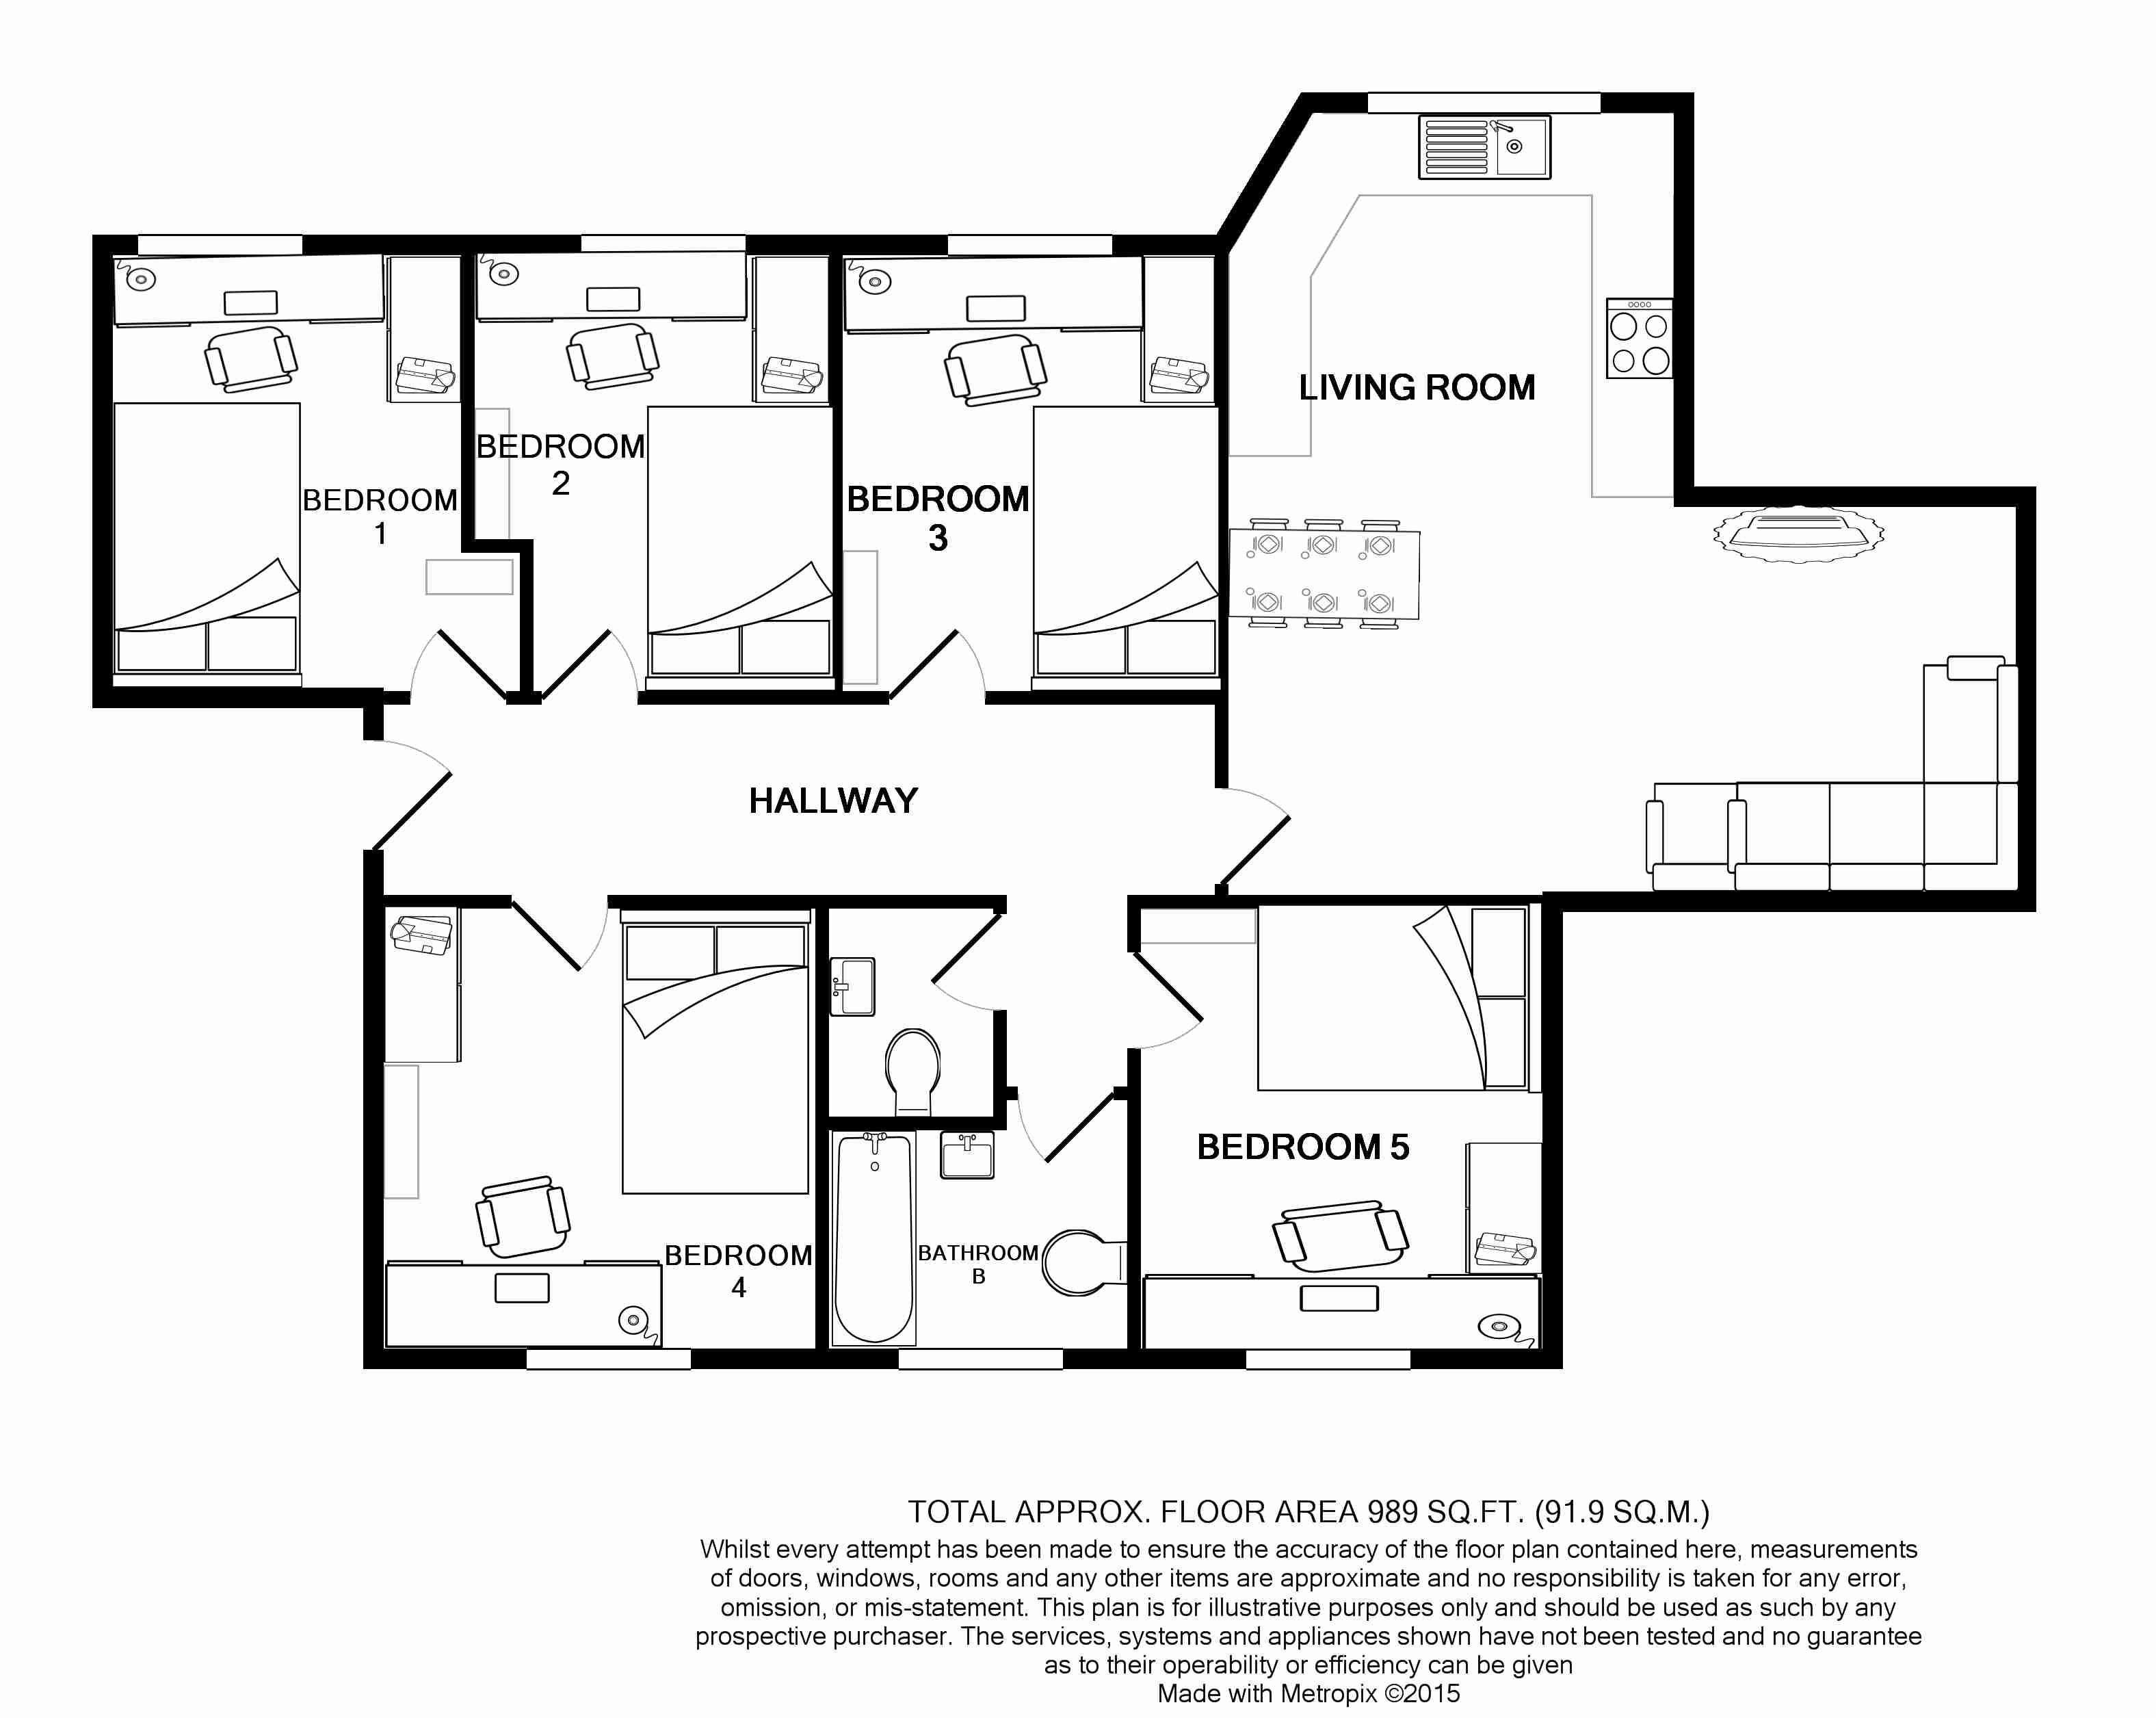 Flat G, Park View, Nottingham Student House, Floorplans